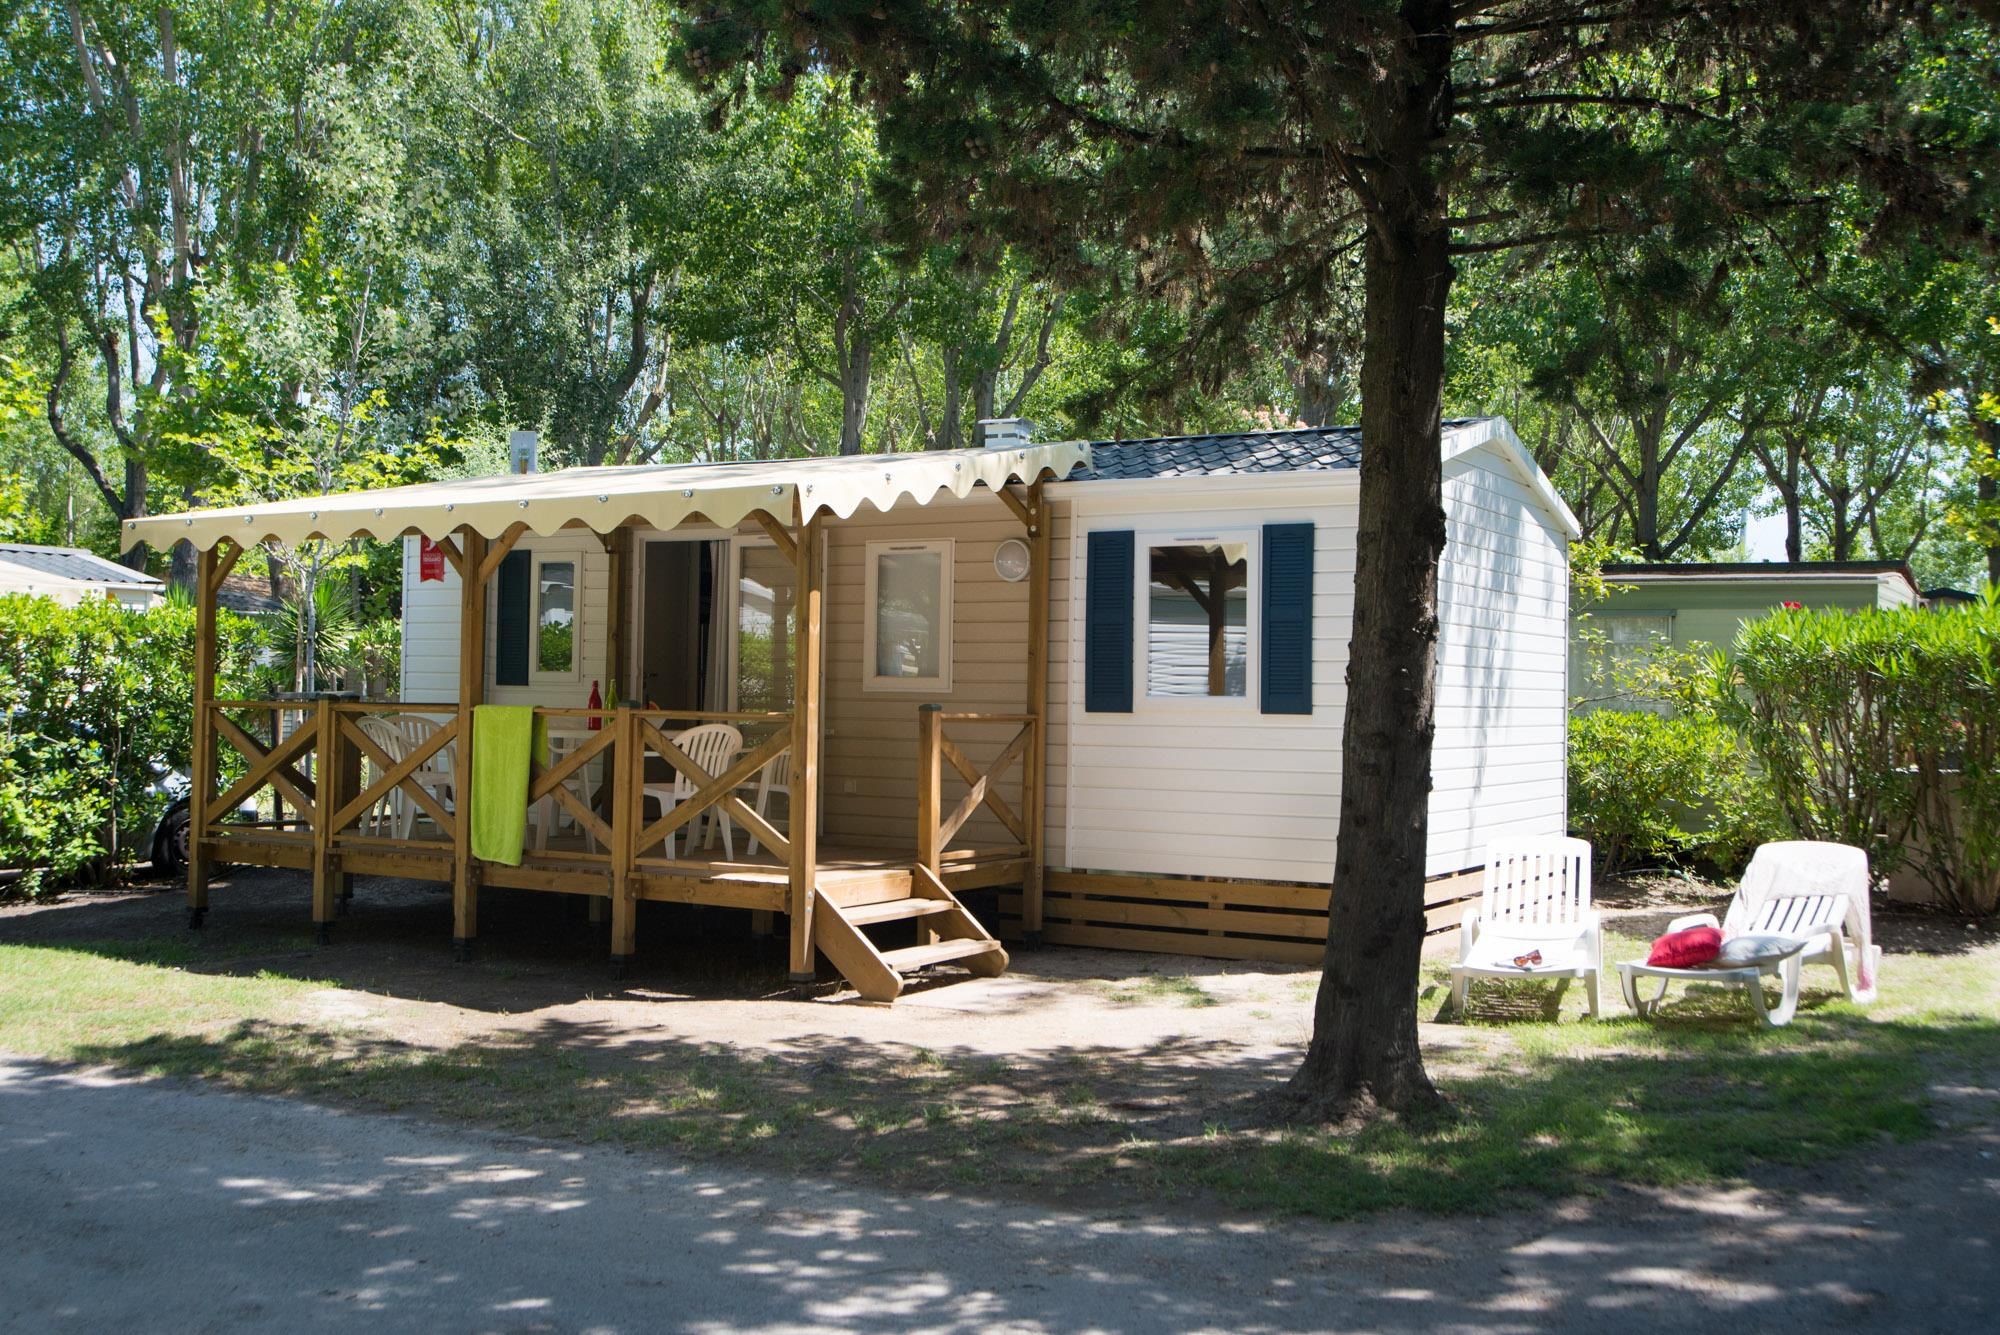 Location - Cottage Famille Plus Premium - Camping Abri de Camargue